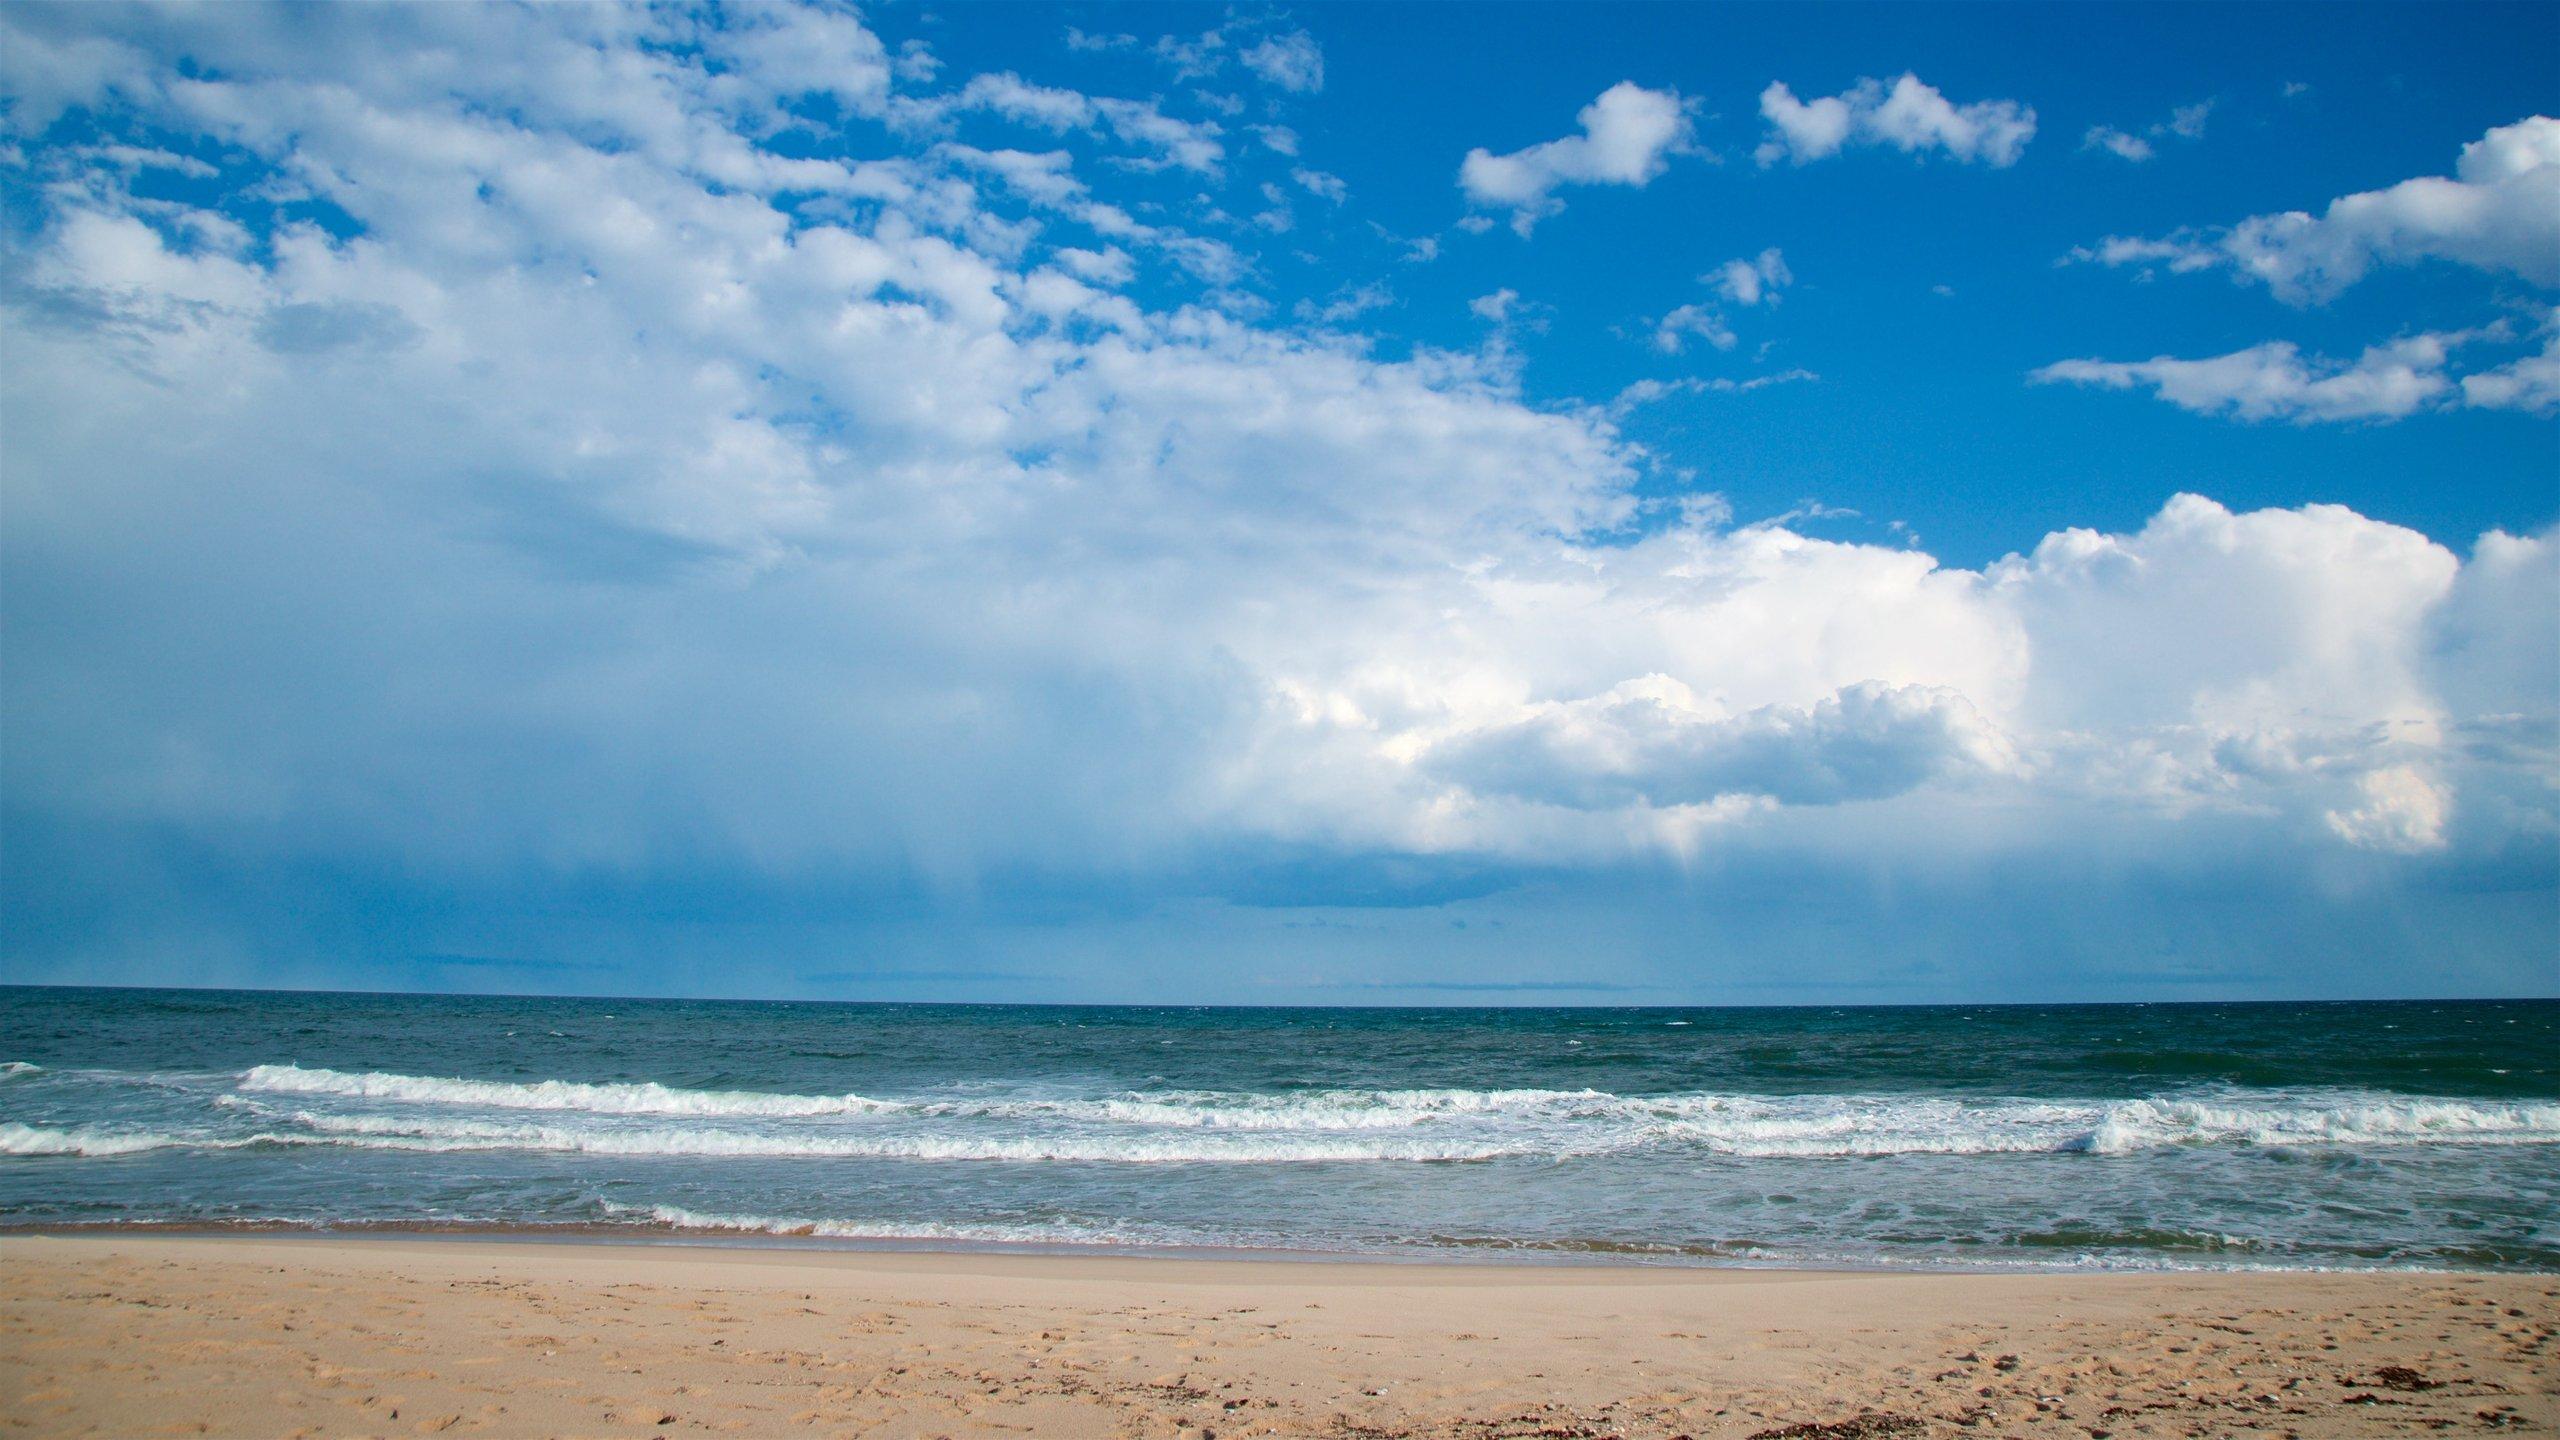 Georgica Beach, New York, United States of America